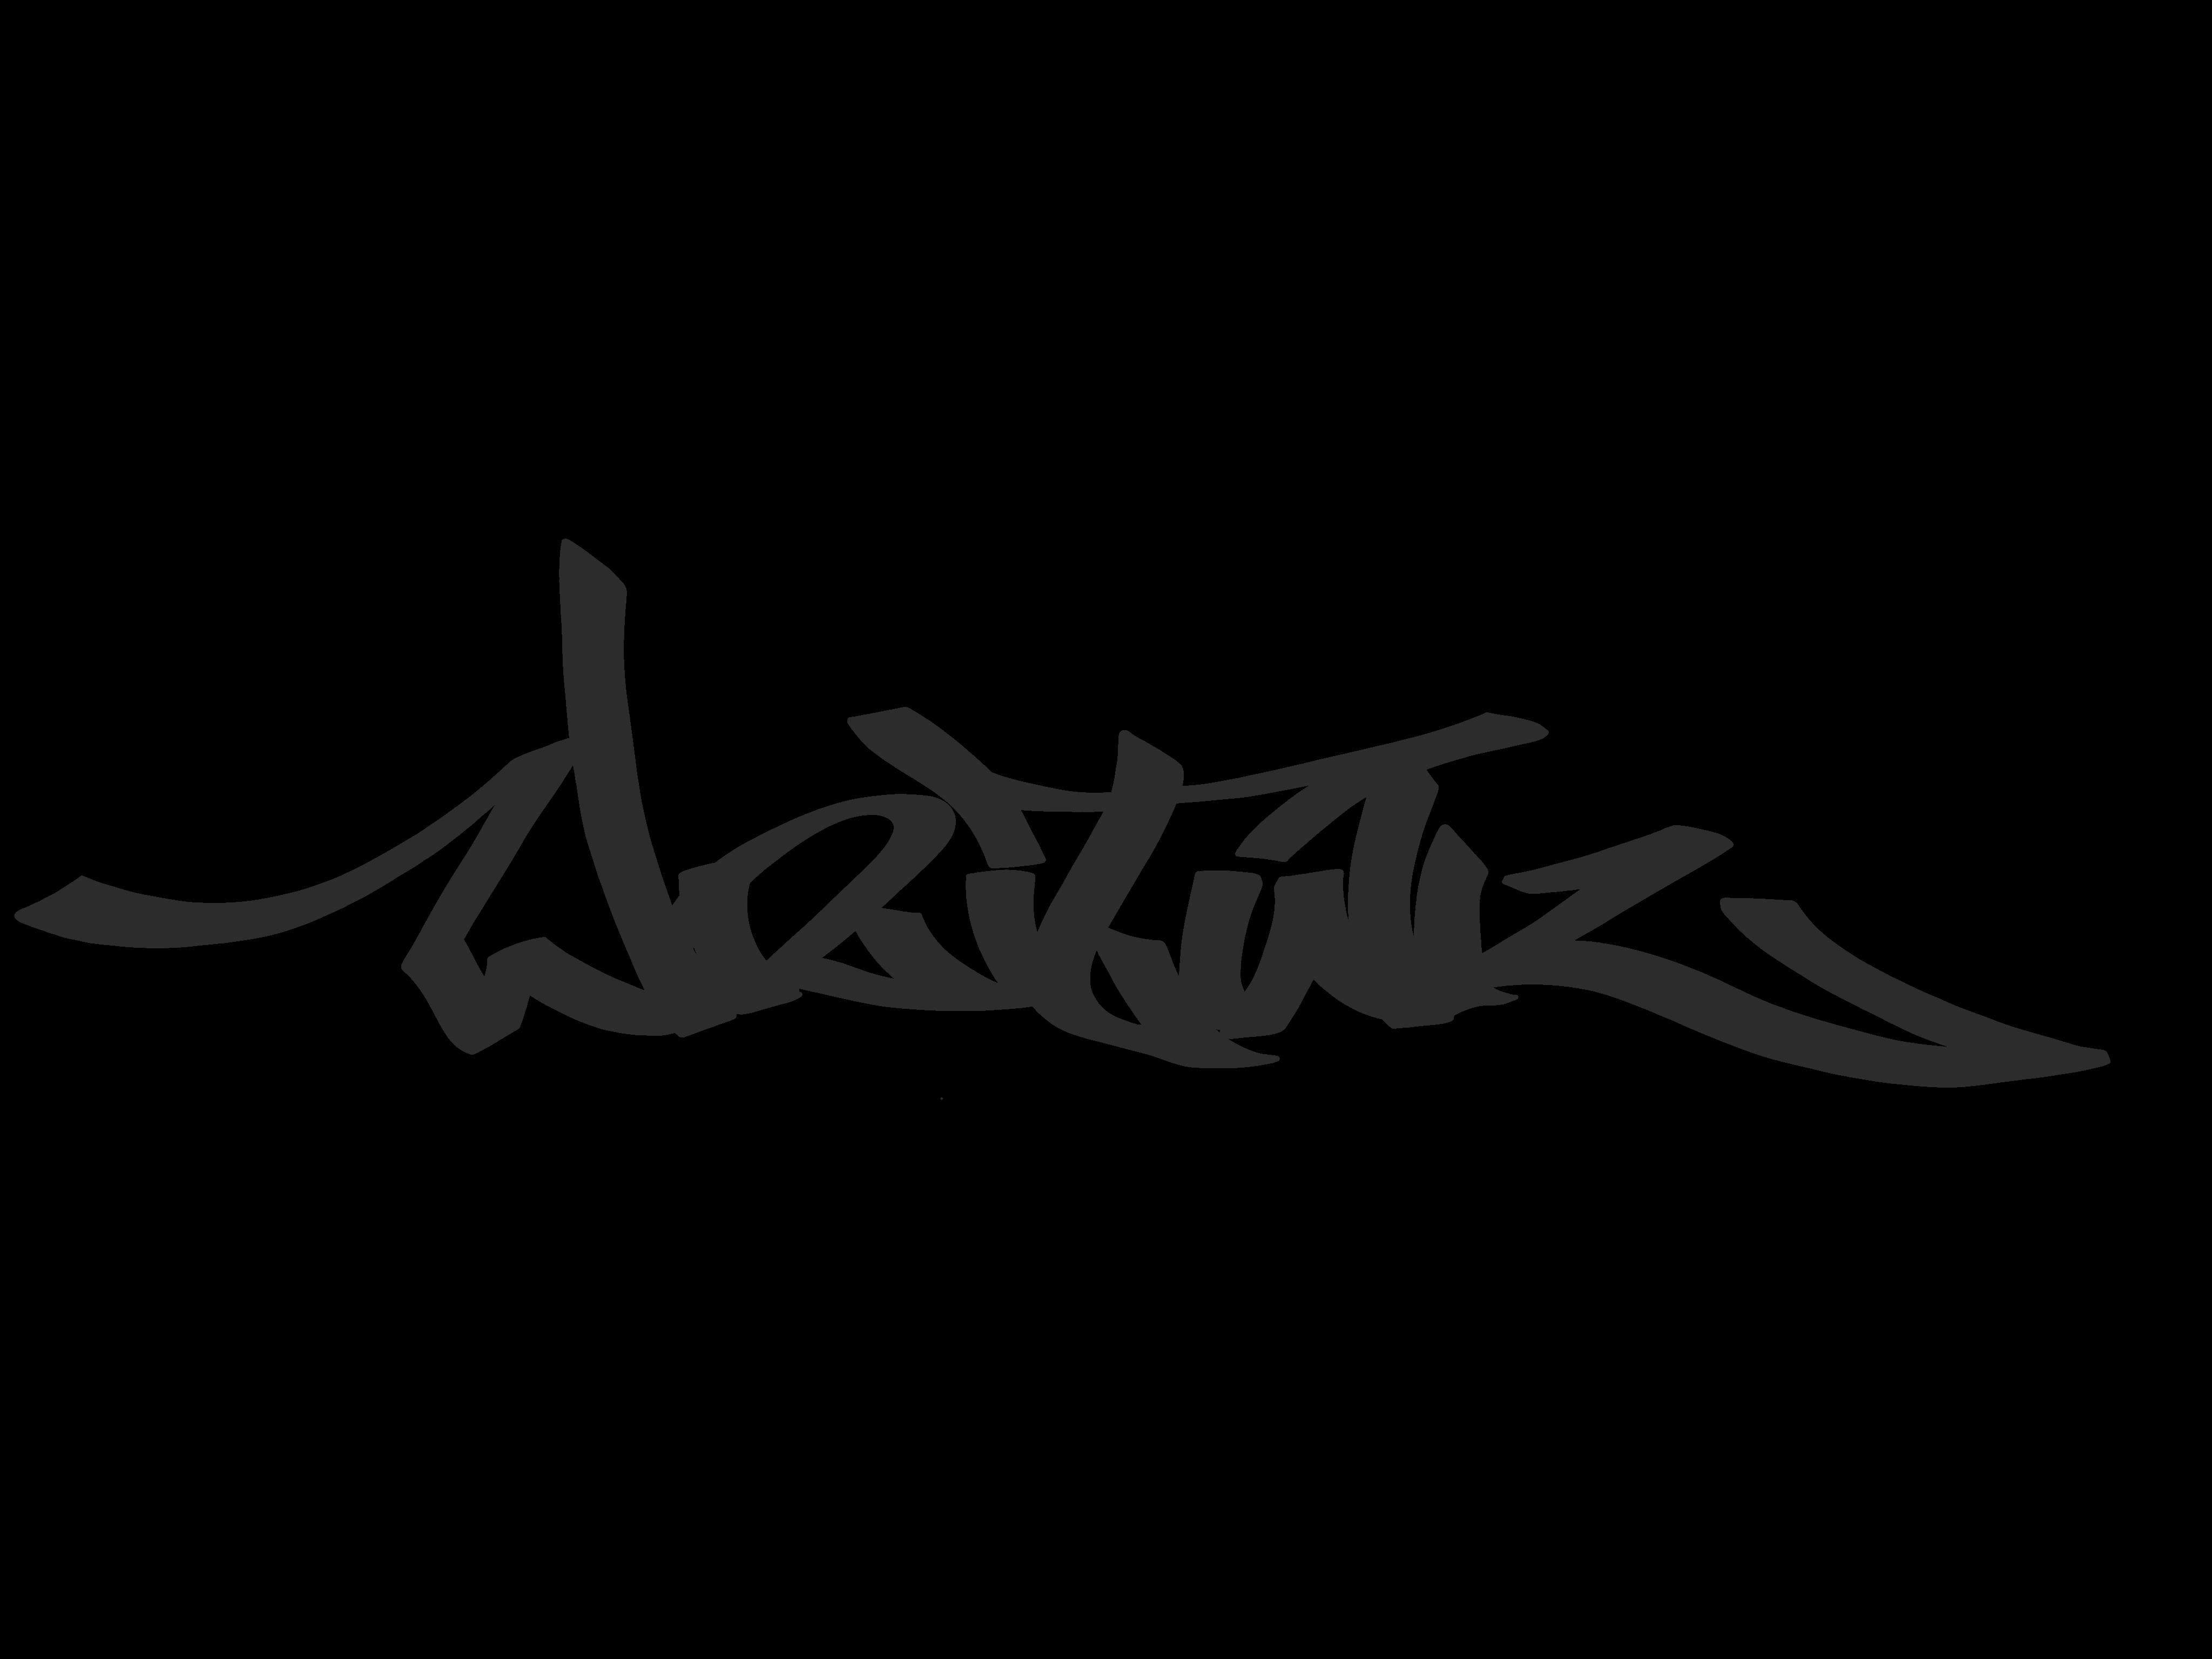 Signature de l'artiste Rister